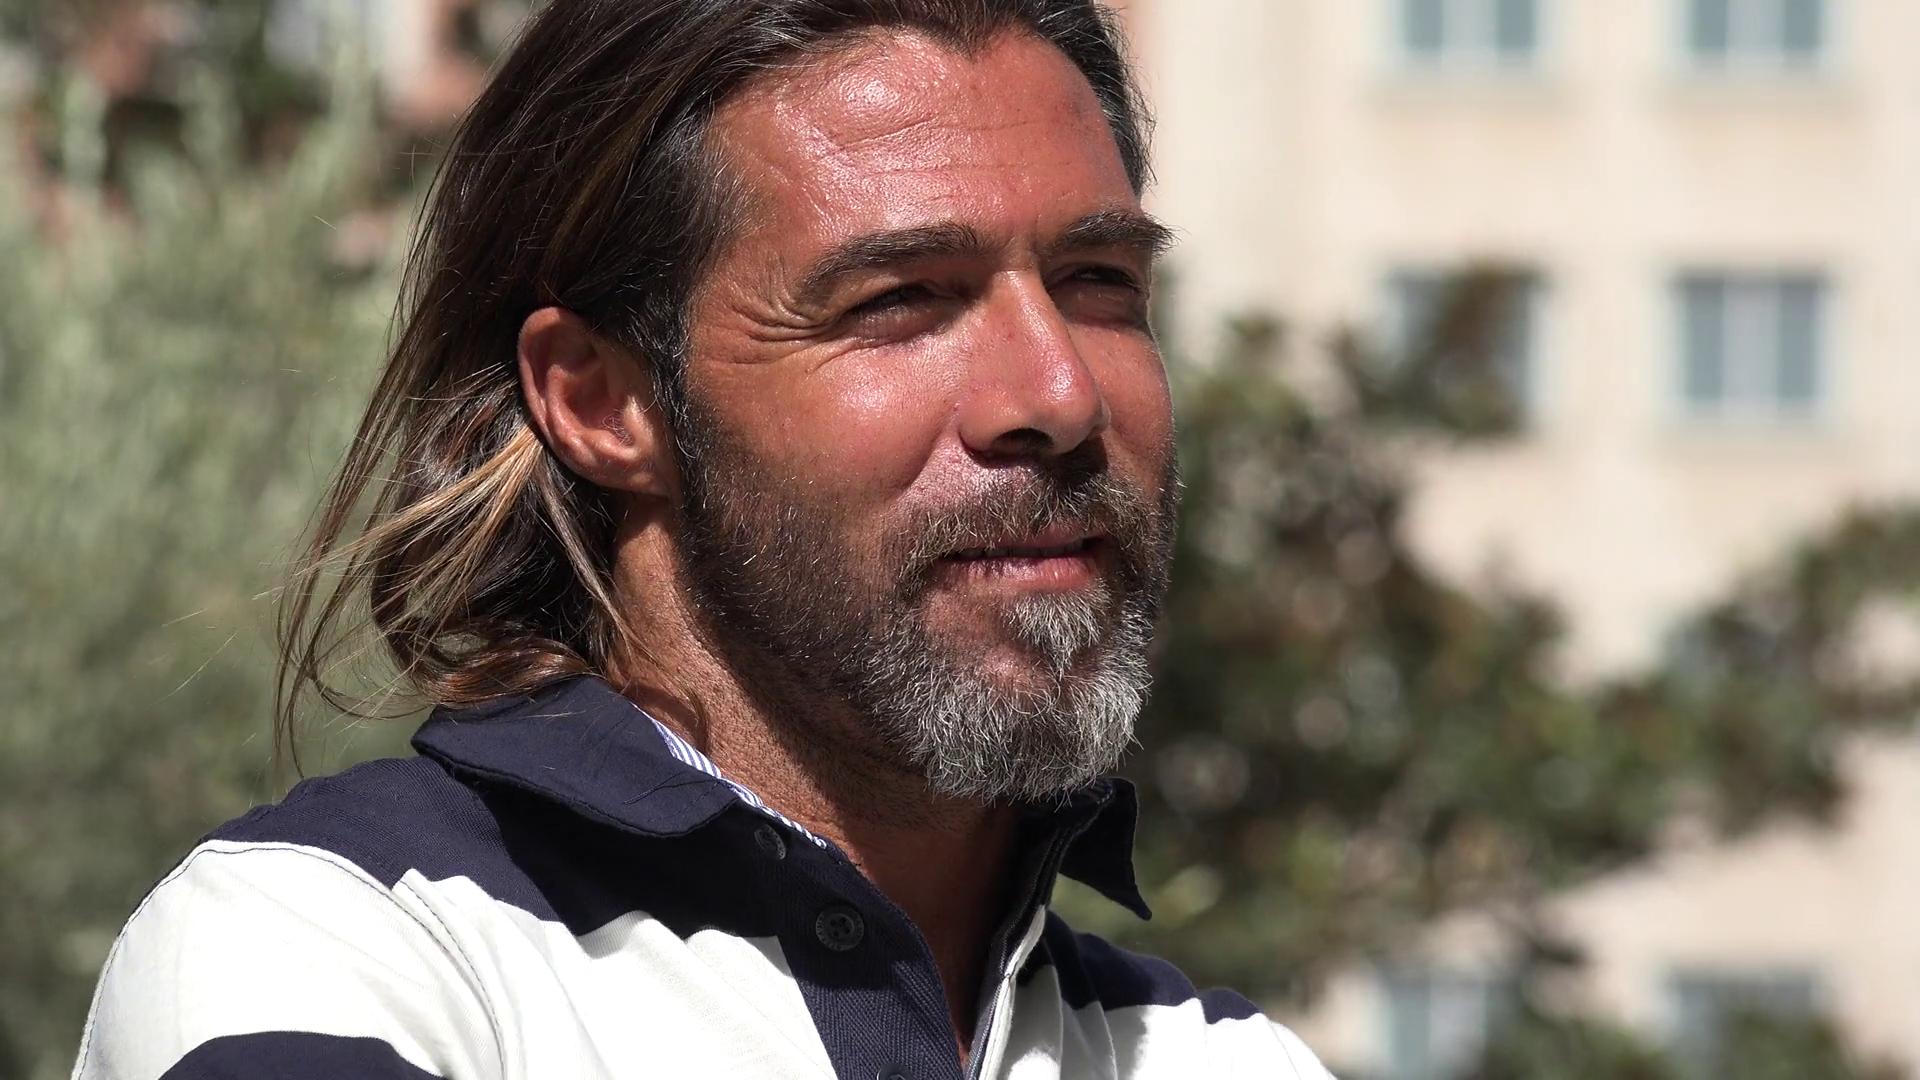 Good Looking Spanish Man Stock Video Footage - Videoblocks